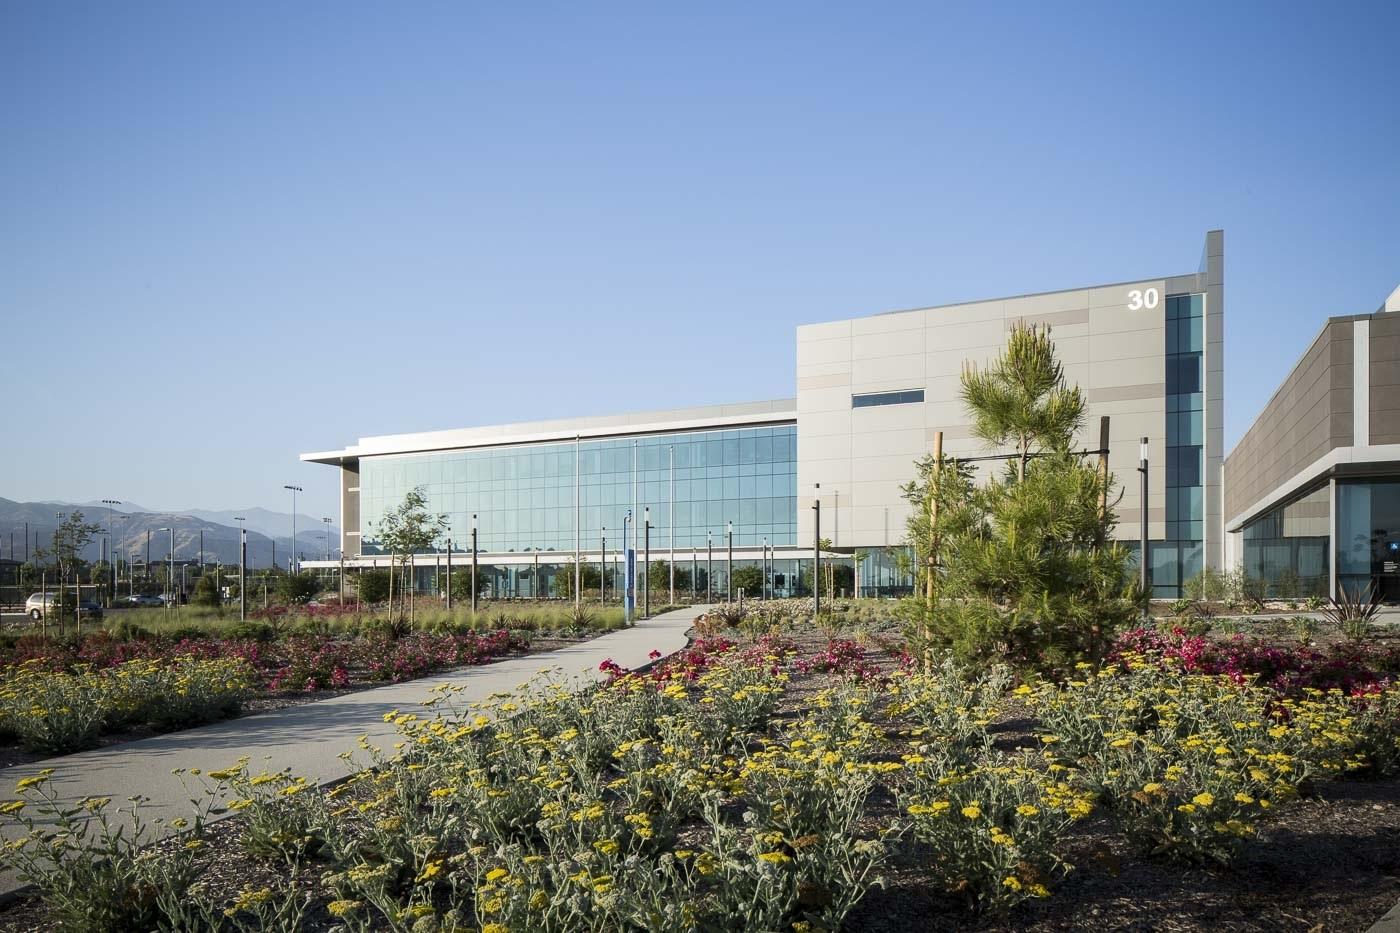 La Verne是位於加利福尼亞州的南部的包裝廠